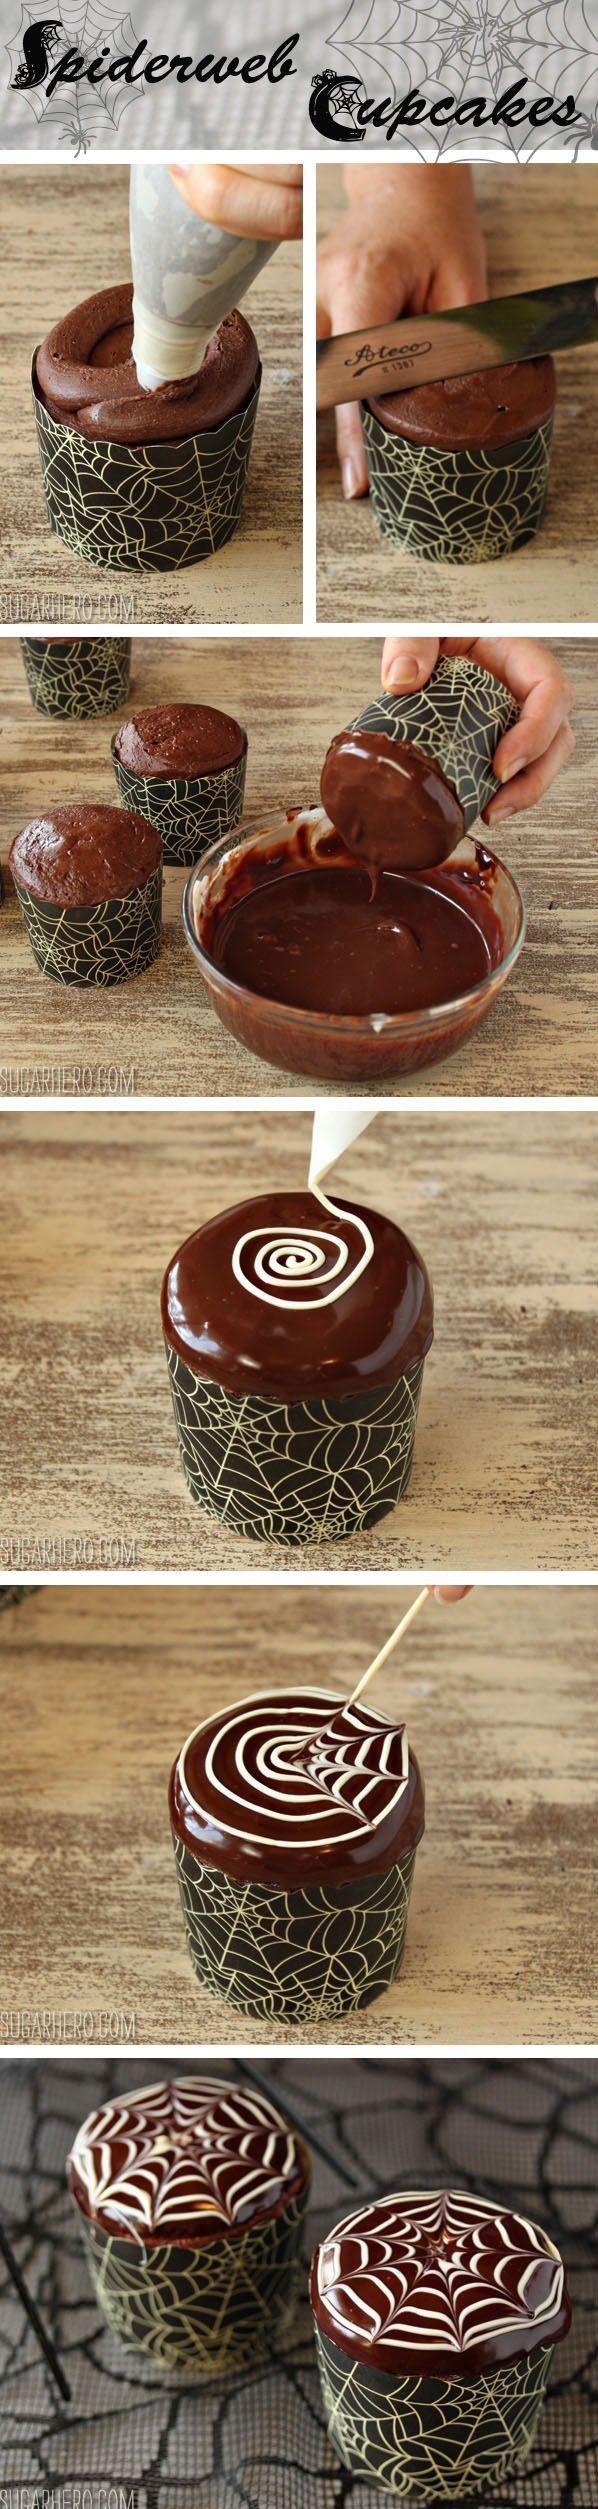 Spiderweb Cupcakes and Chocolate Spiders - SugarHero